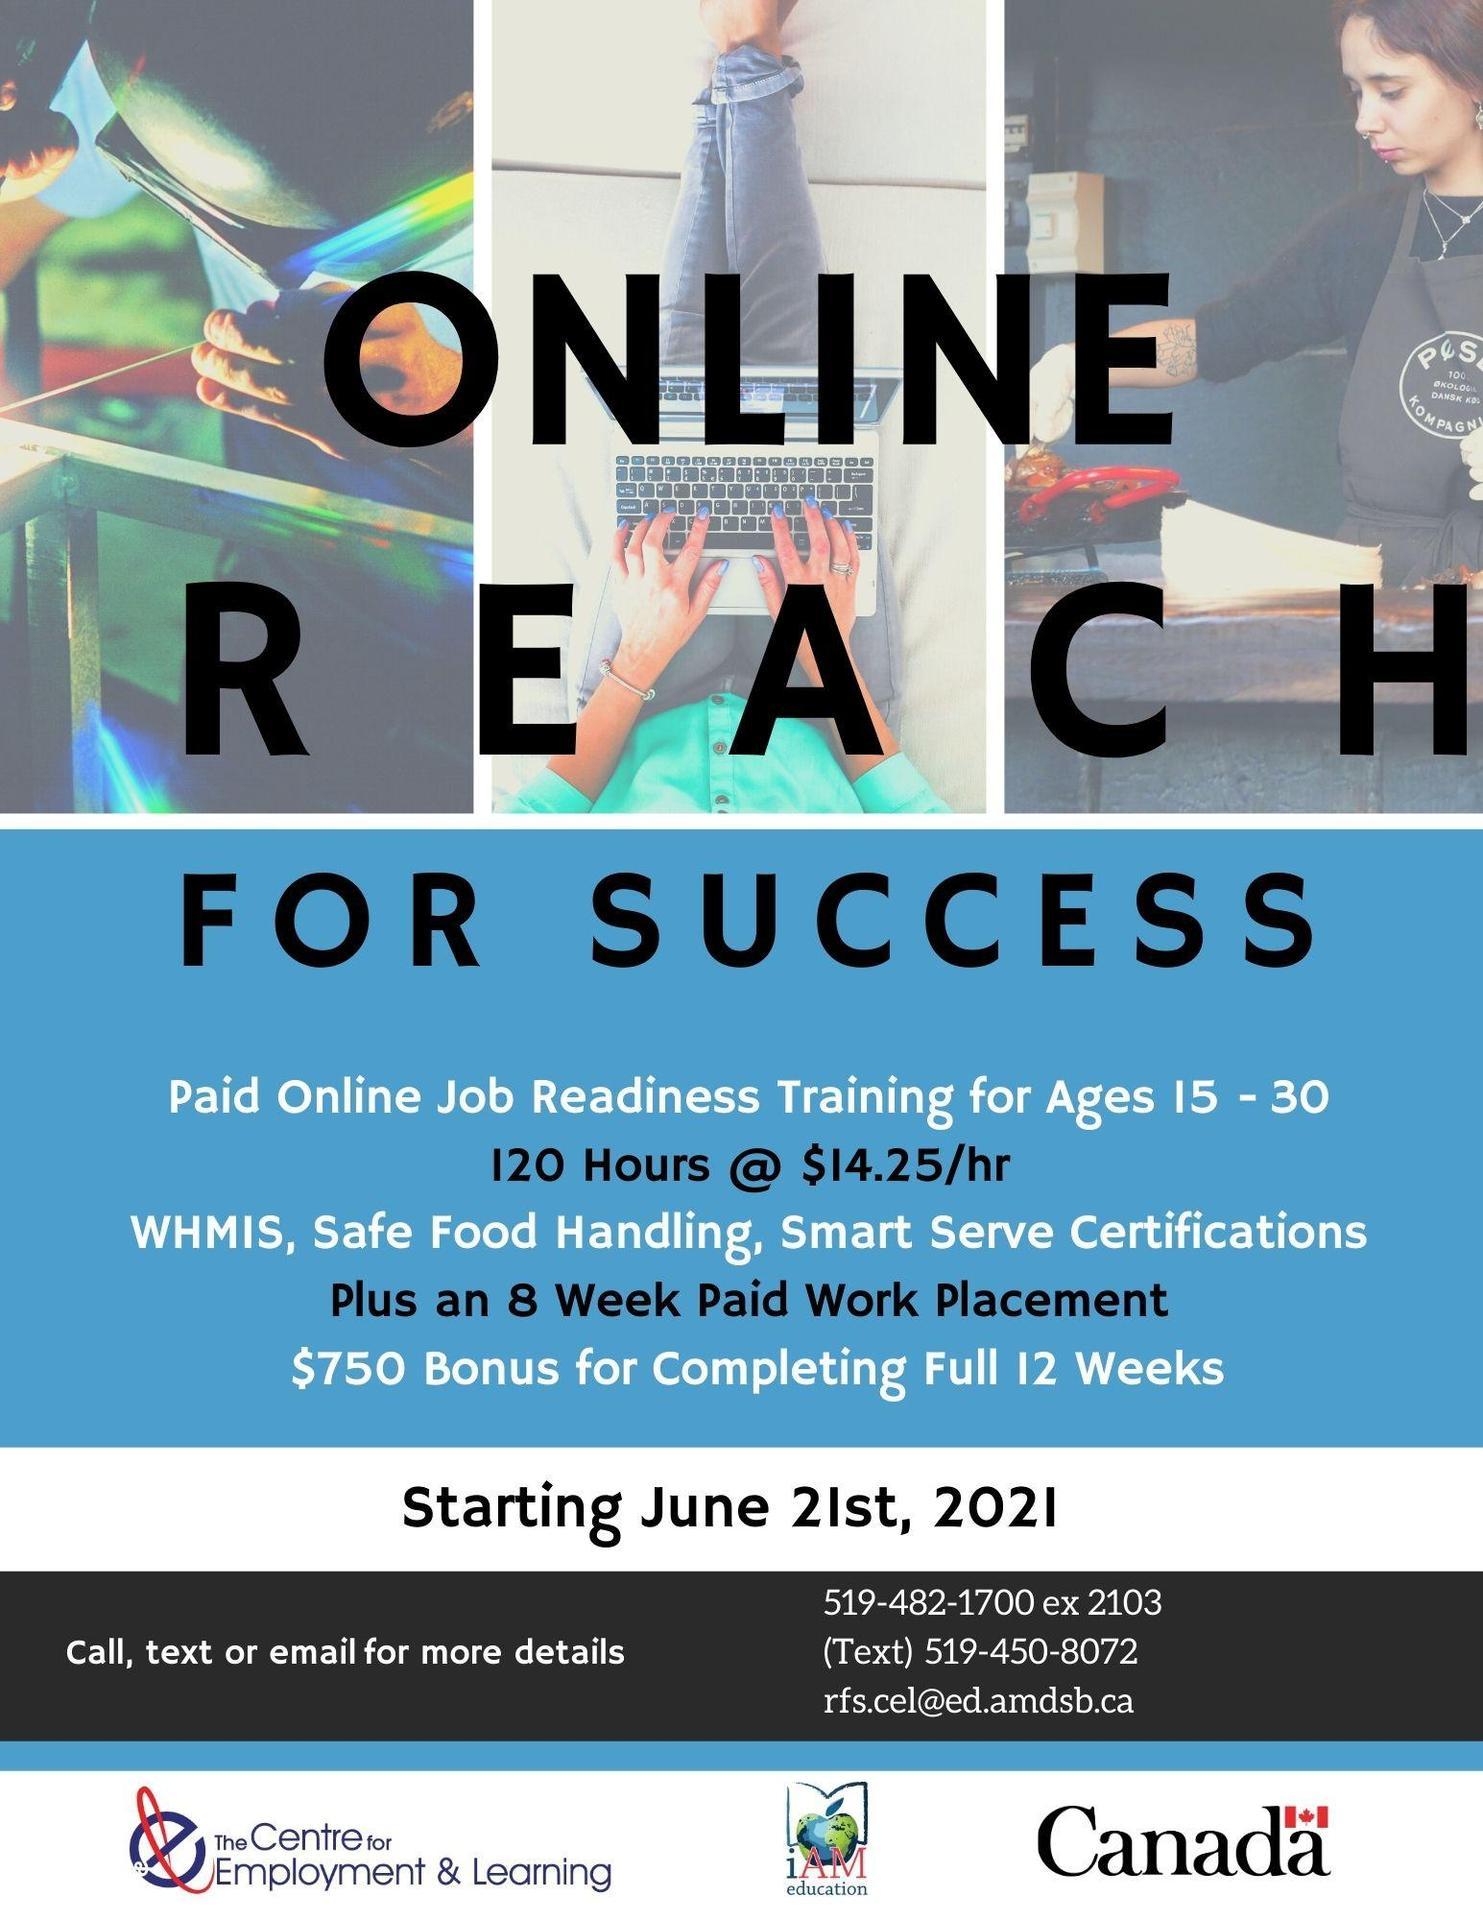 Next Cohort Starts June 21st, 2021